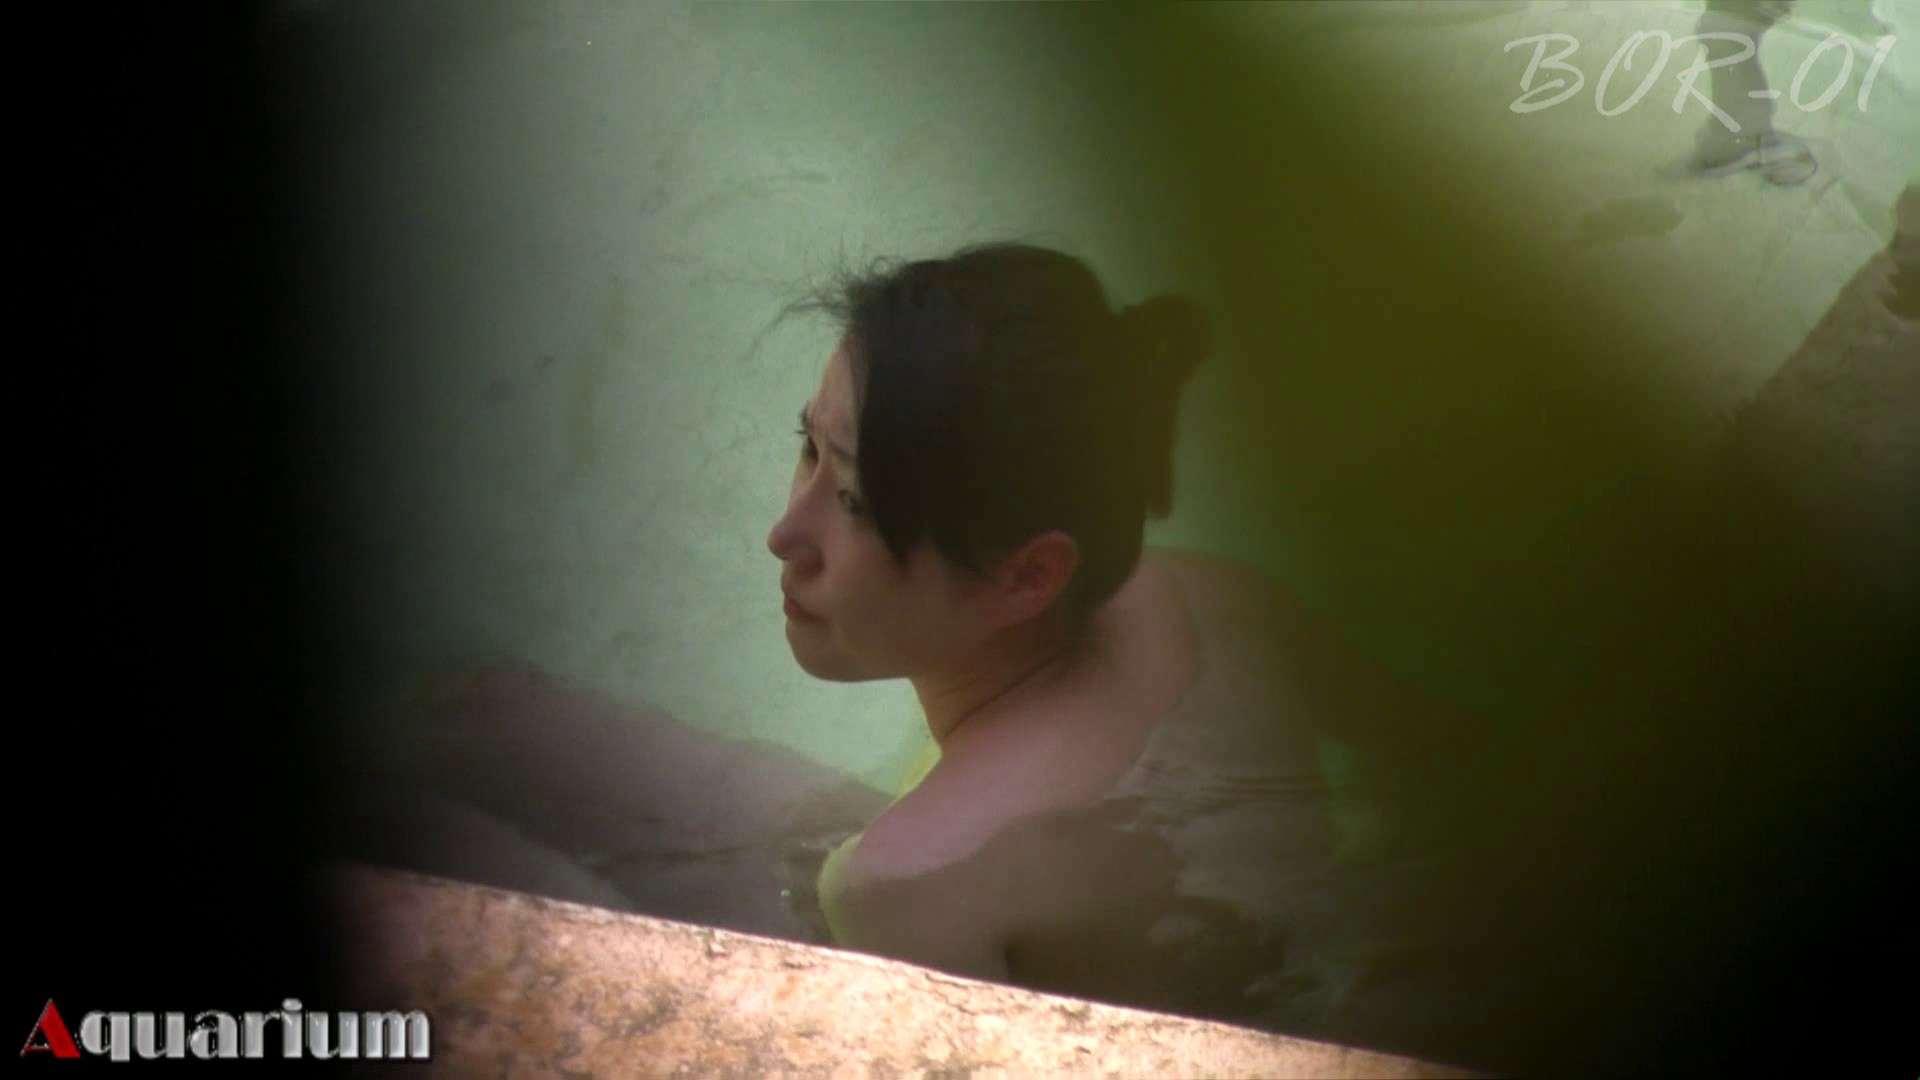 Aquaな露天風呂Vol.461 露天風呂 | OLのエロ生活  64連発 4